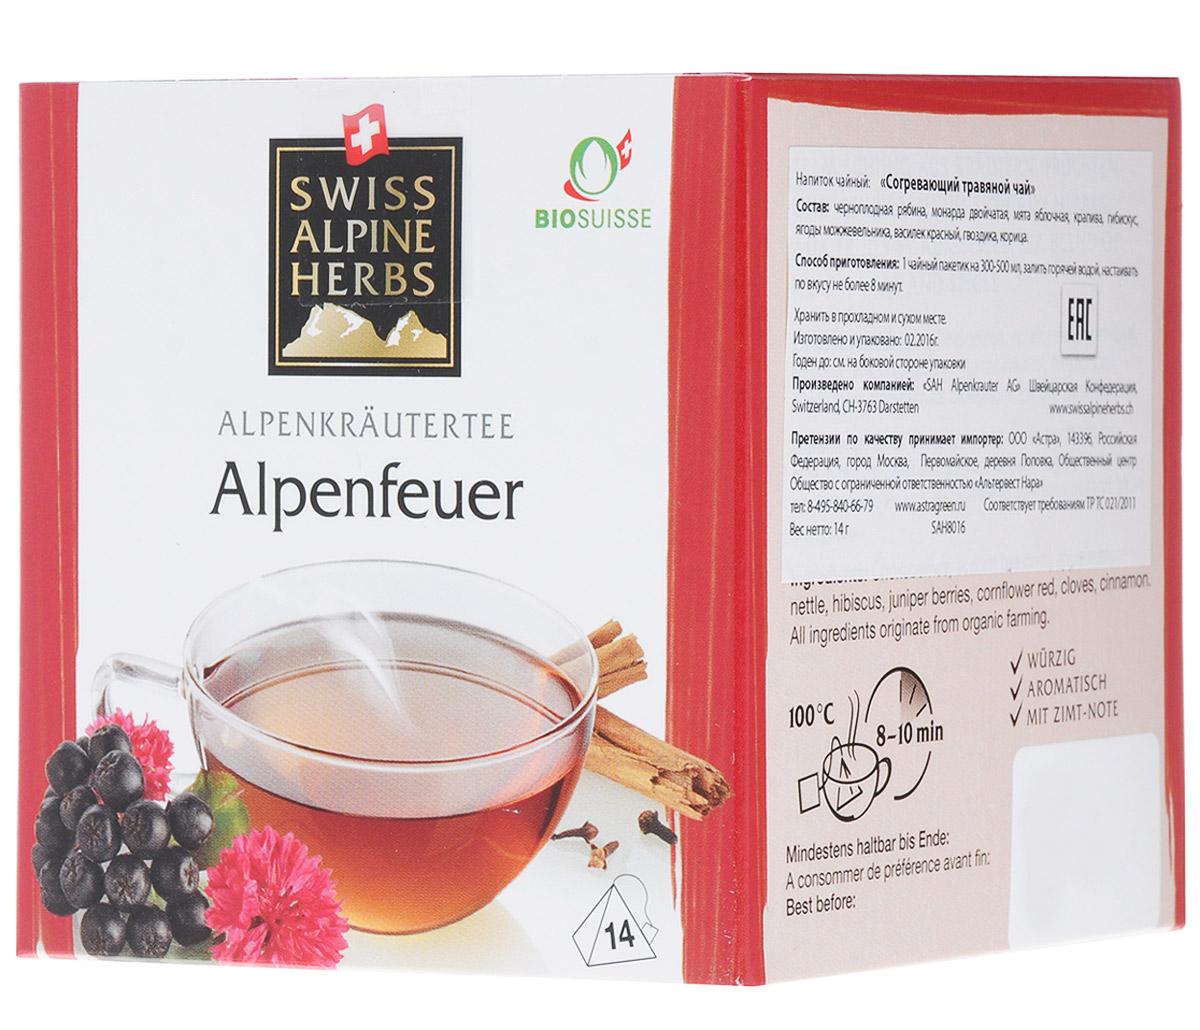 Swiss Alpine Herbs Согревающий травяной чай в пакетиках, 14 шт чай swiss alpin herbs травяной альпийский гламур 14 пакетиков для чайника